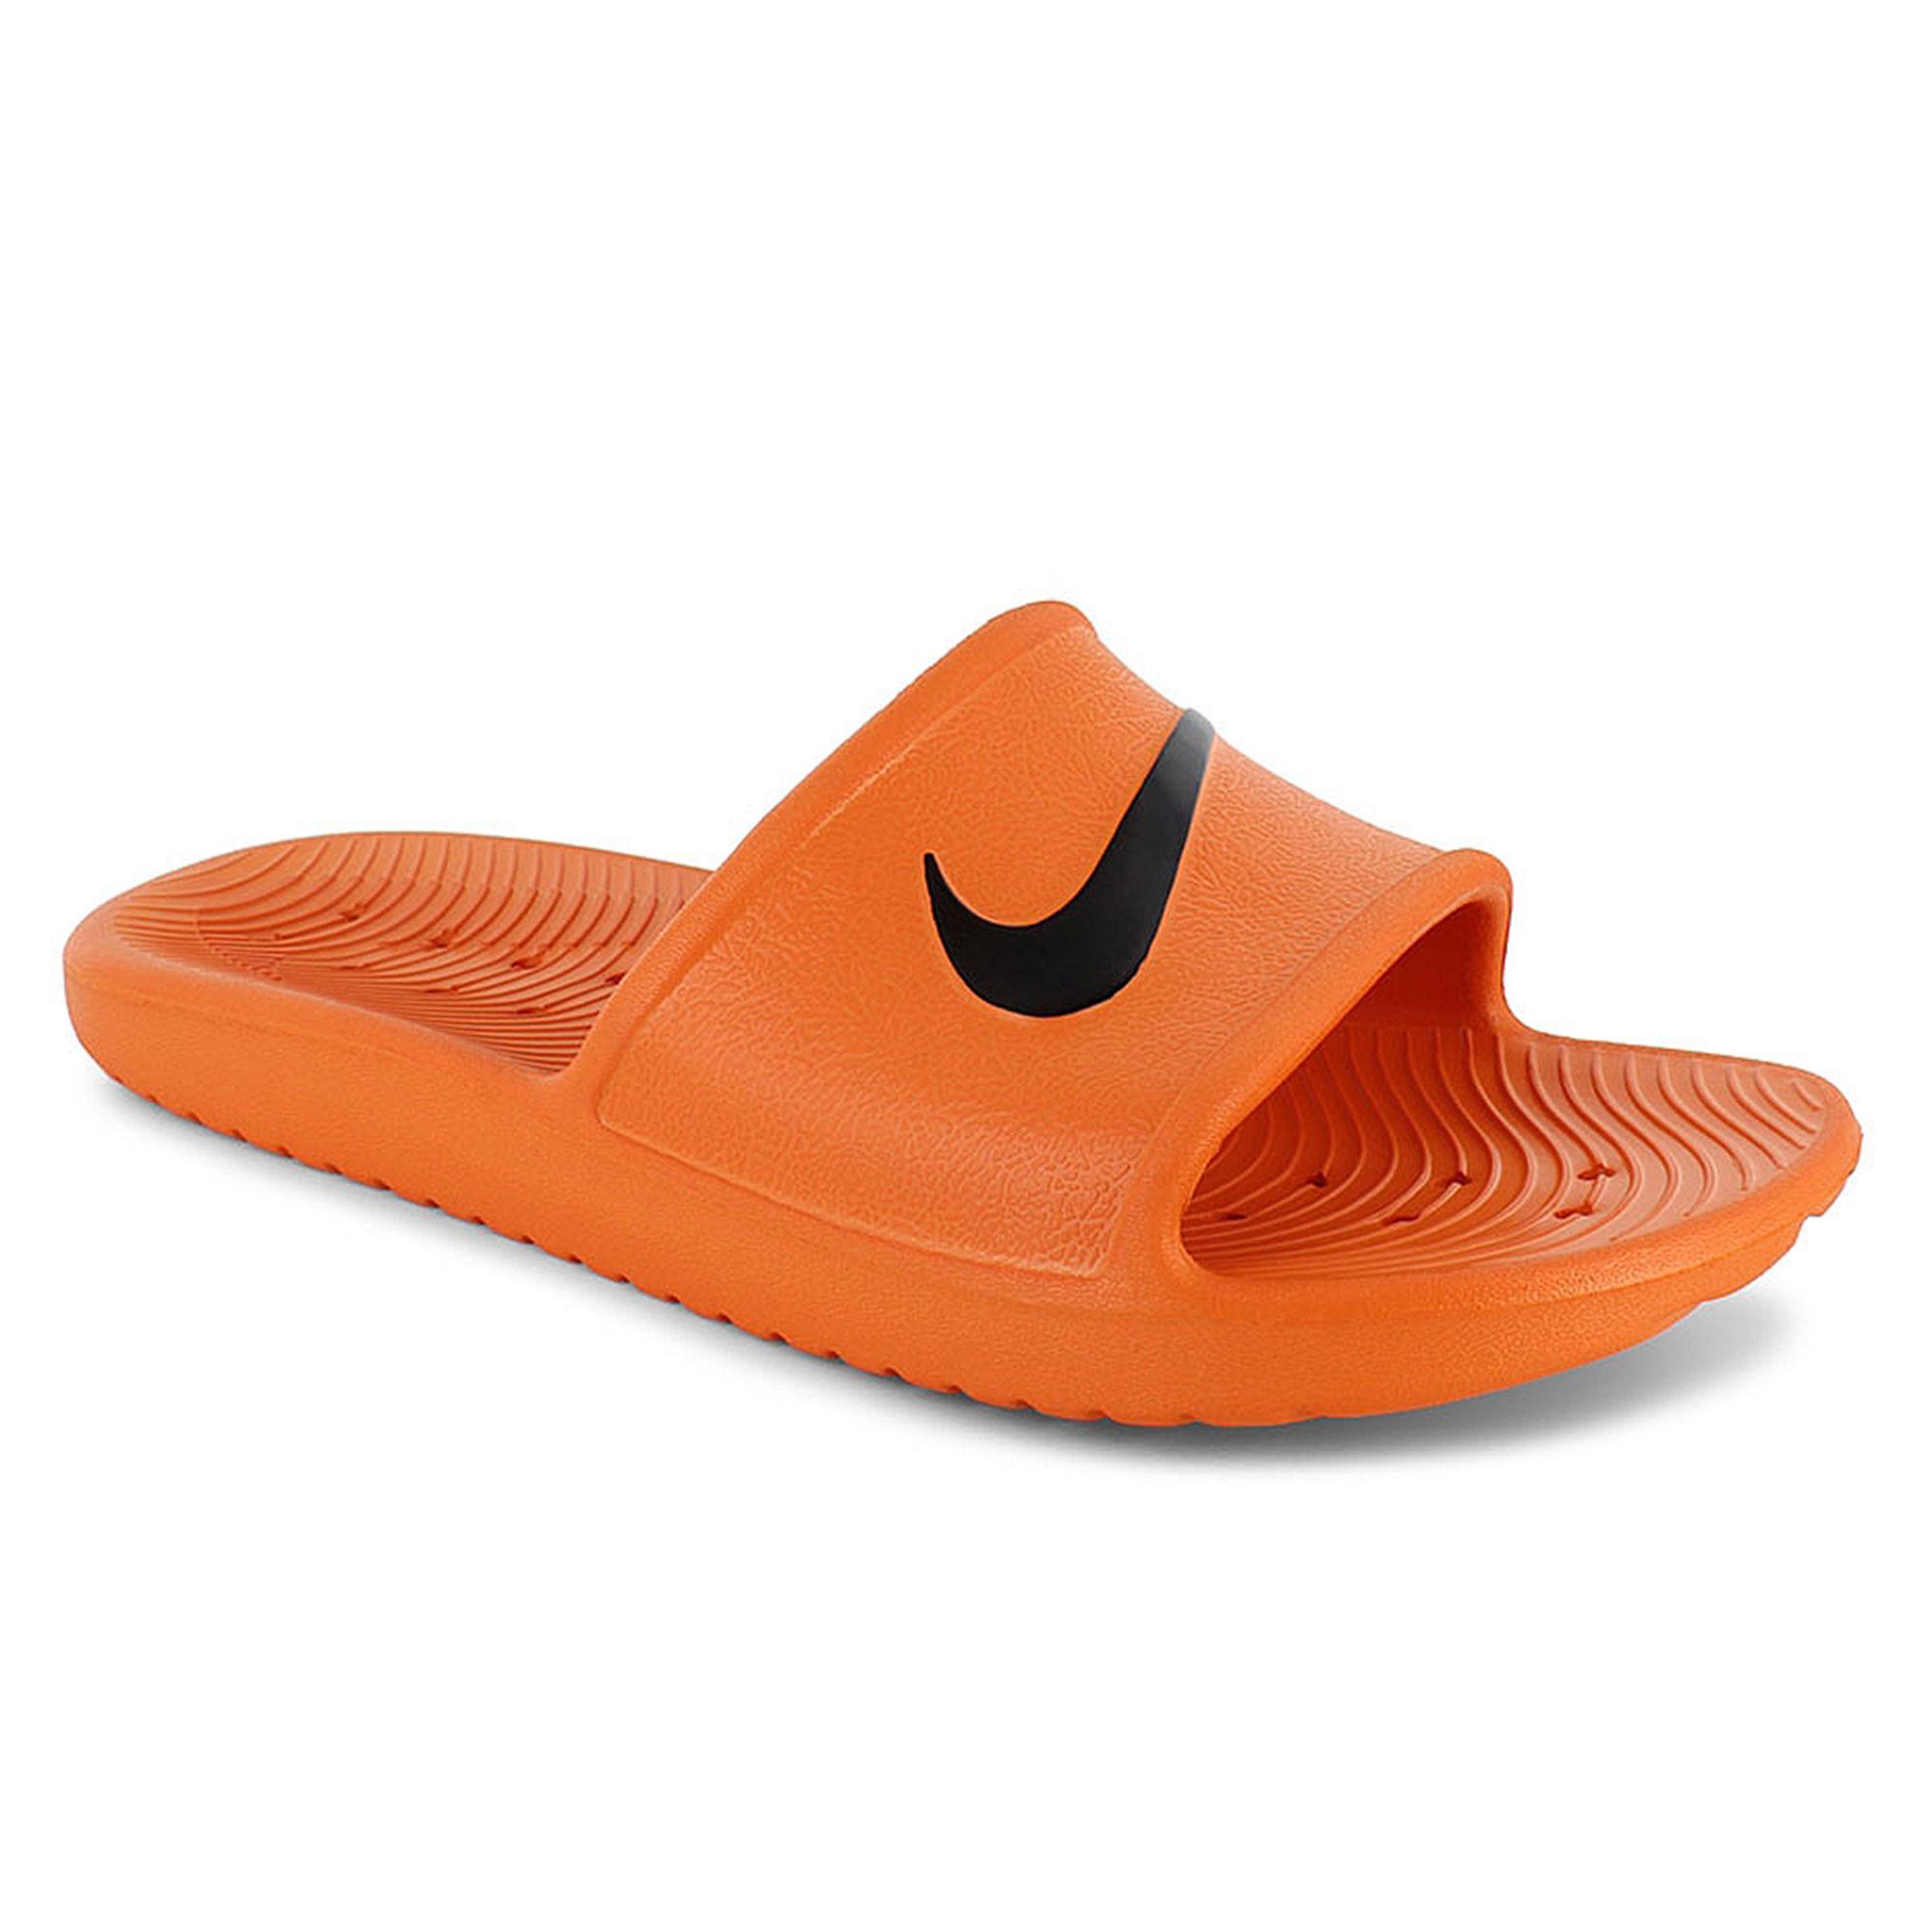 meet ab6a7 7c5cd Nike Kawa Shower